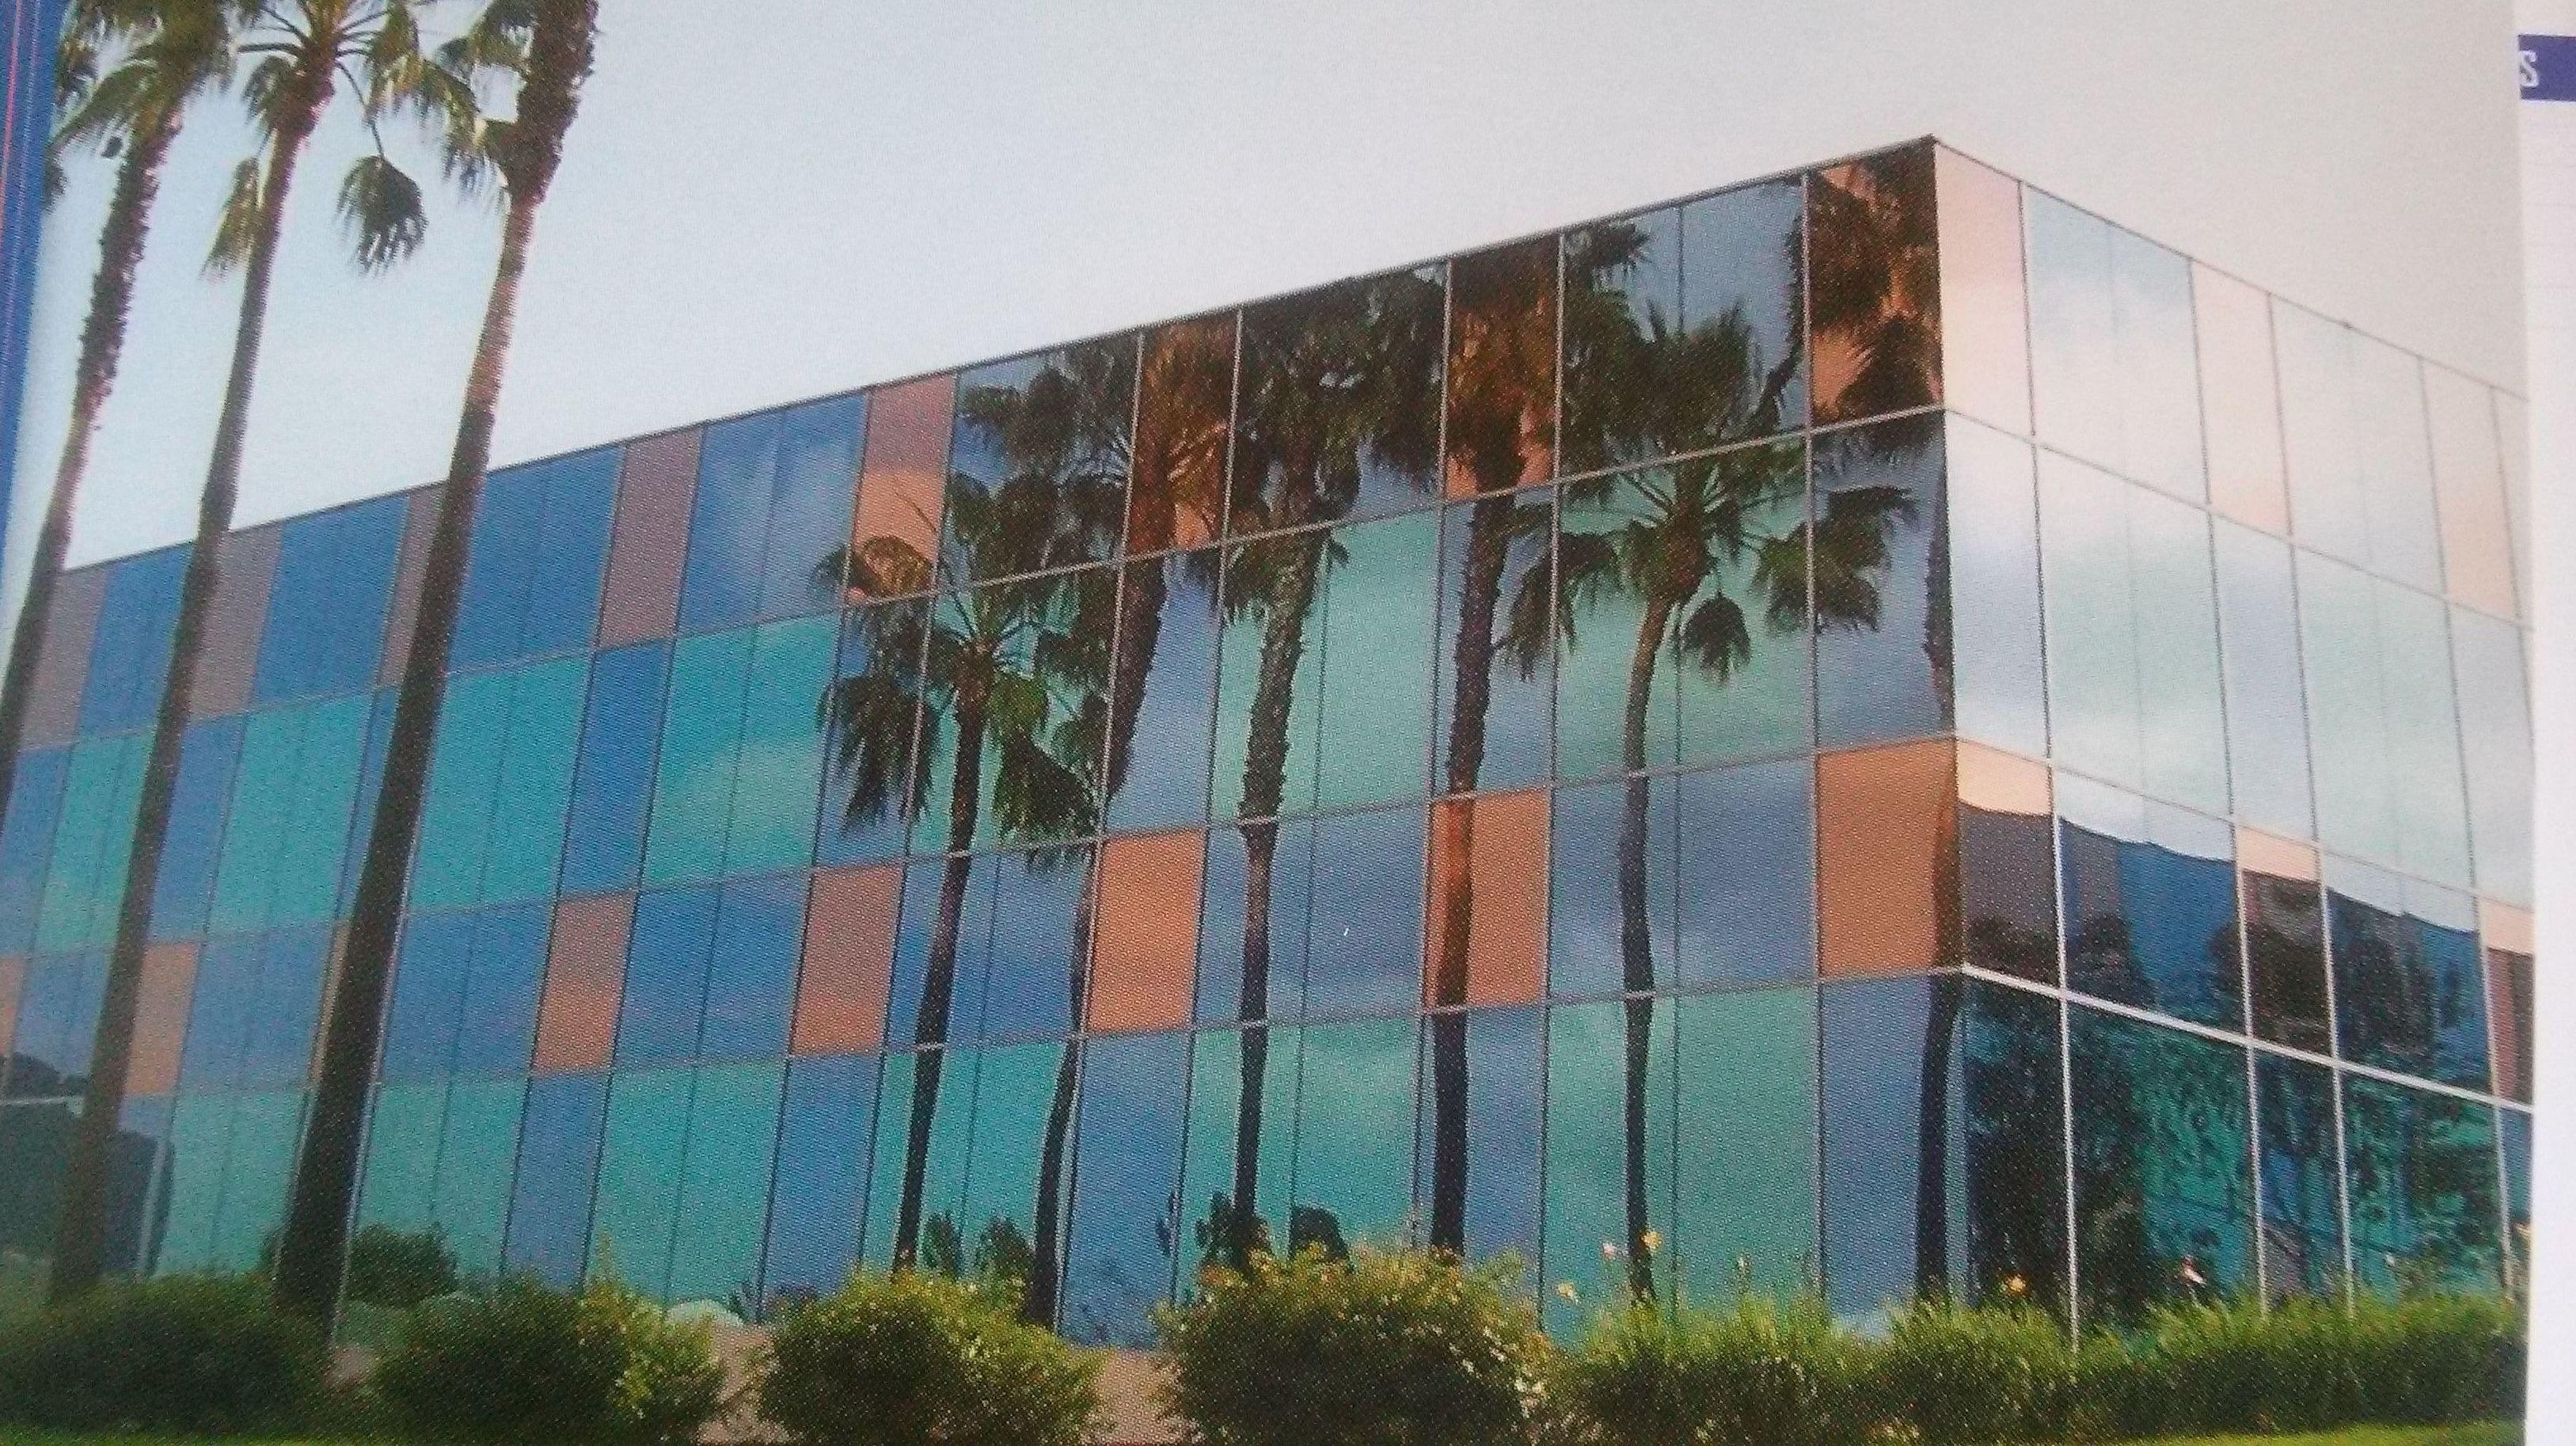 Instalación de lámina solar : ¿Qué realizamos?  de Información